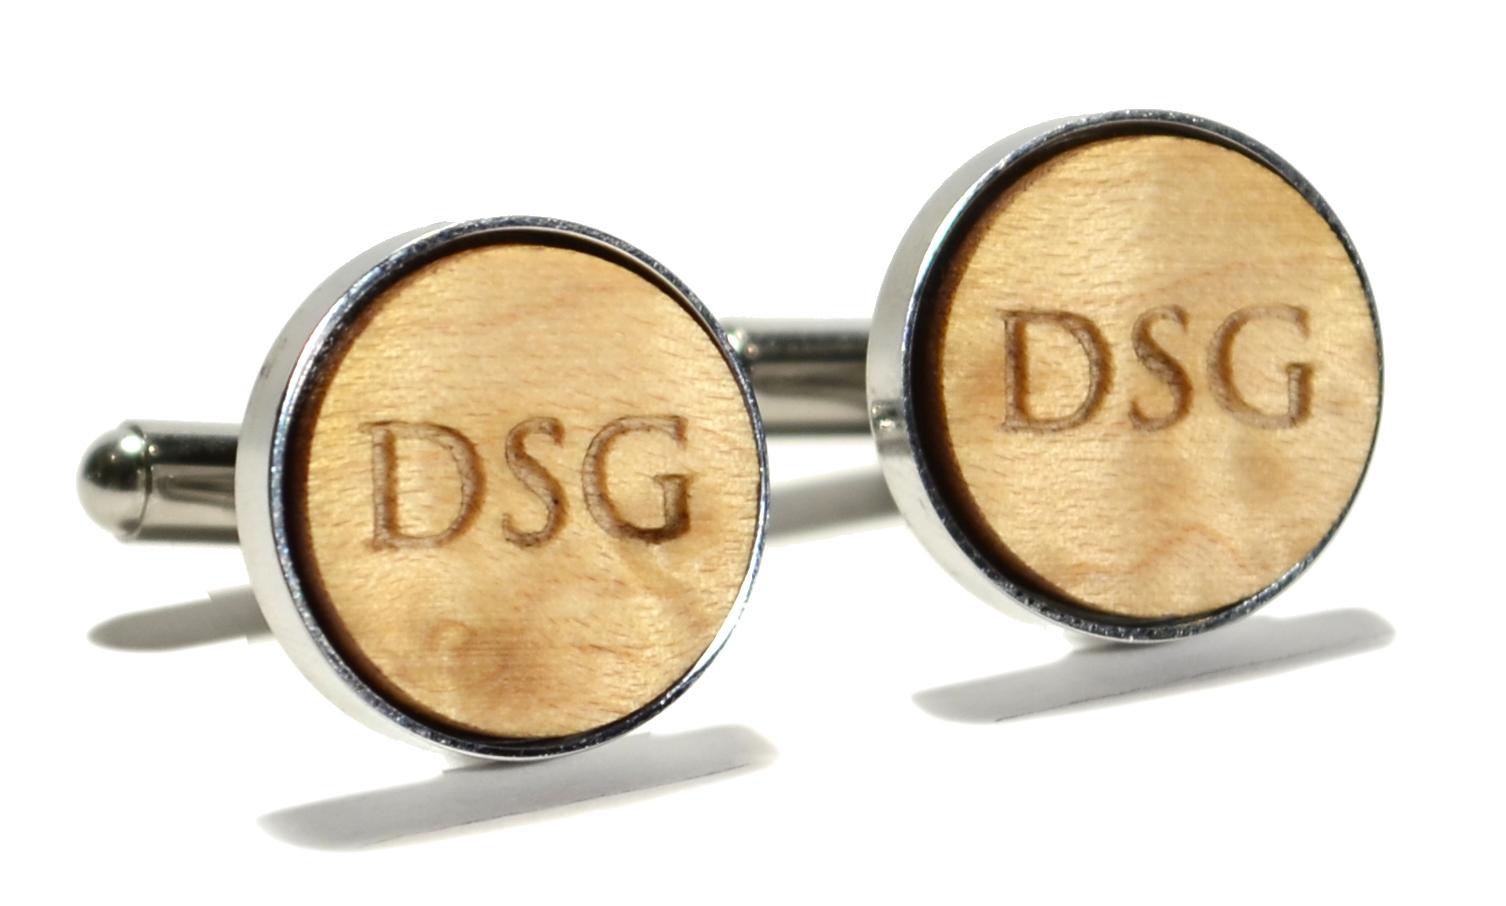 bridseye maple wood monogram stainless steel cufflinks 16mm